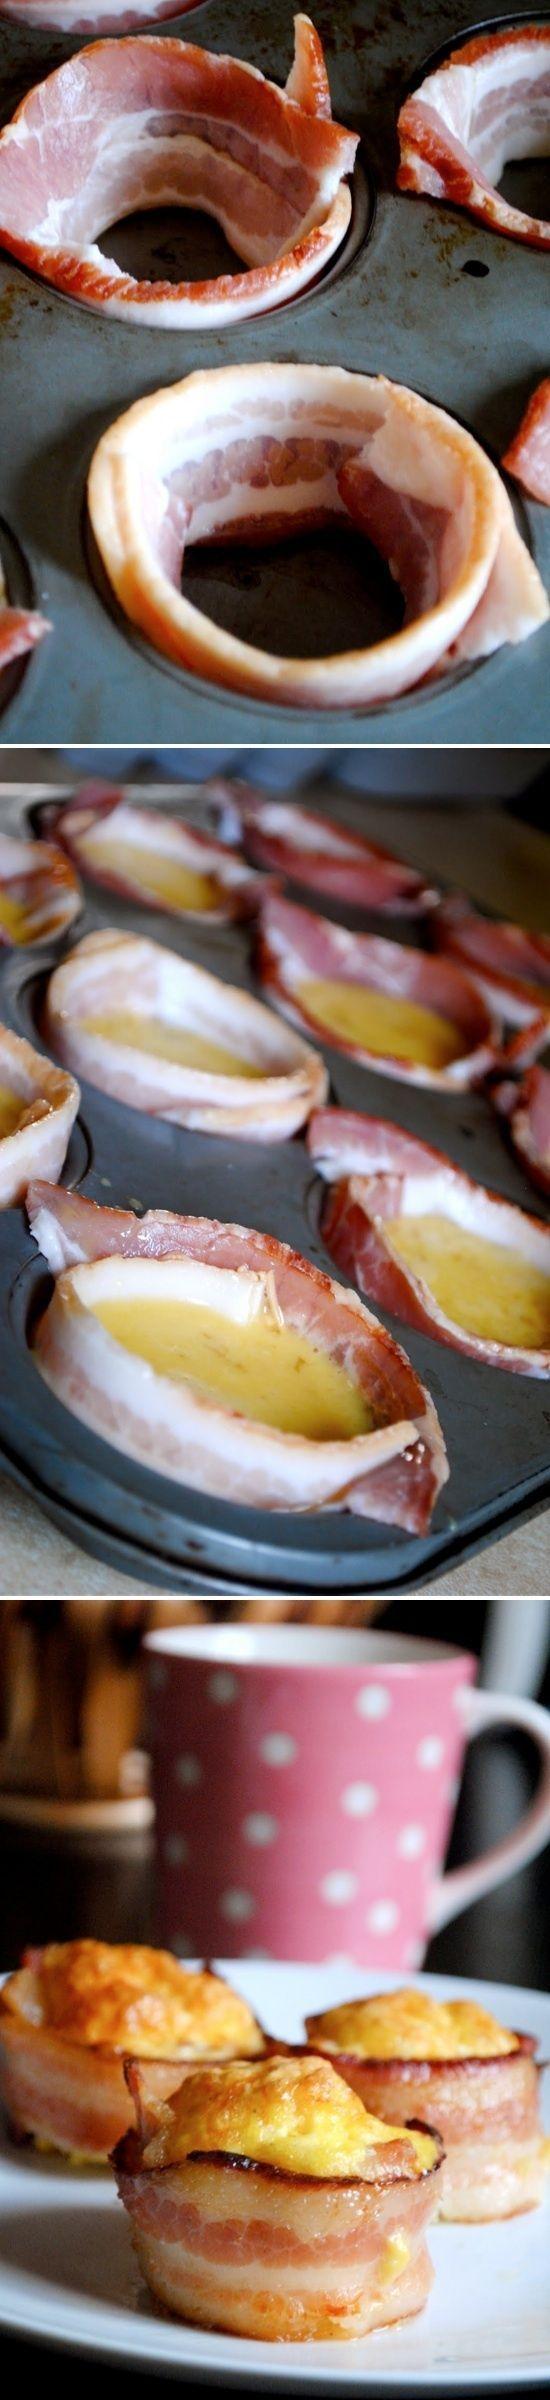 DIY Mini Bacon Egg Cup DIY Projects